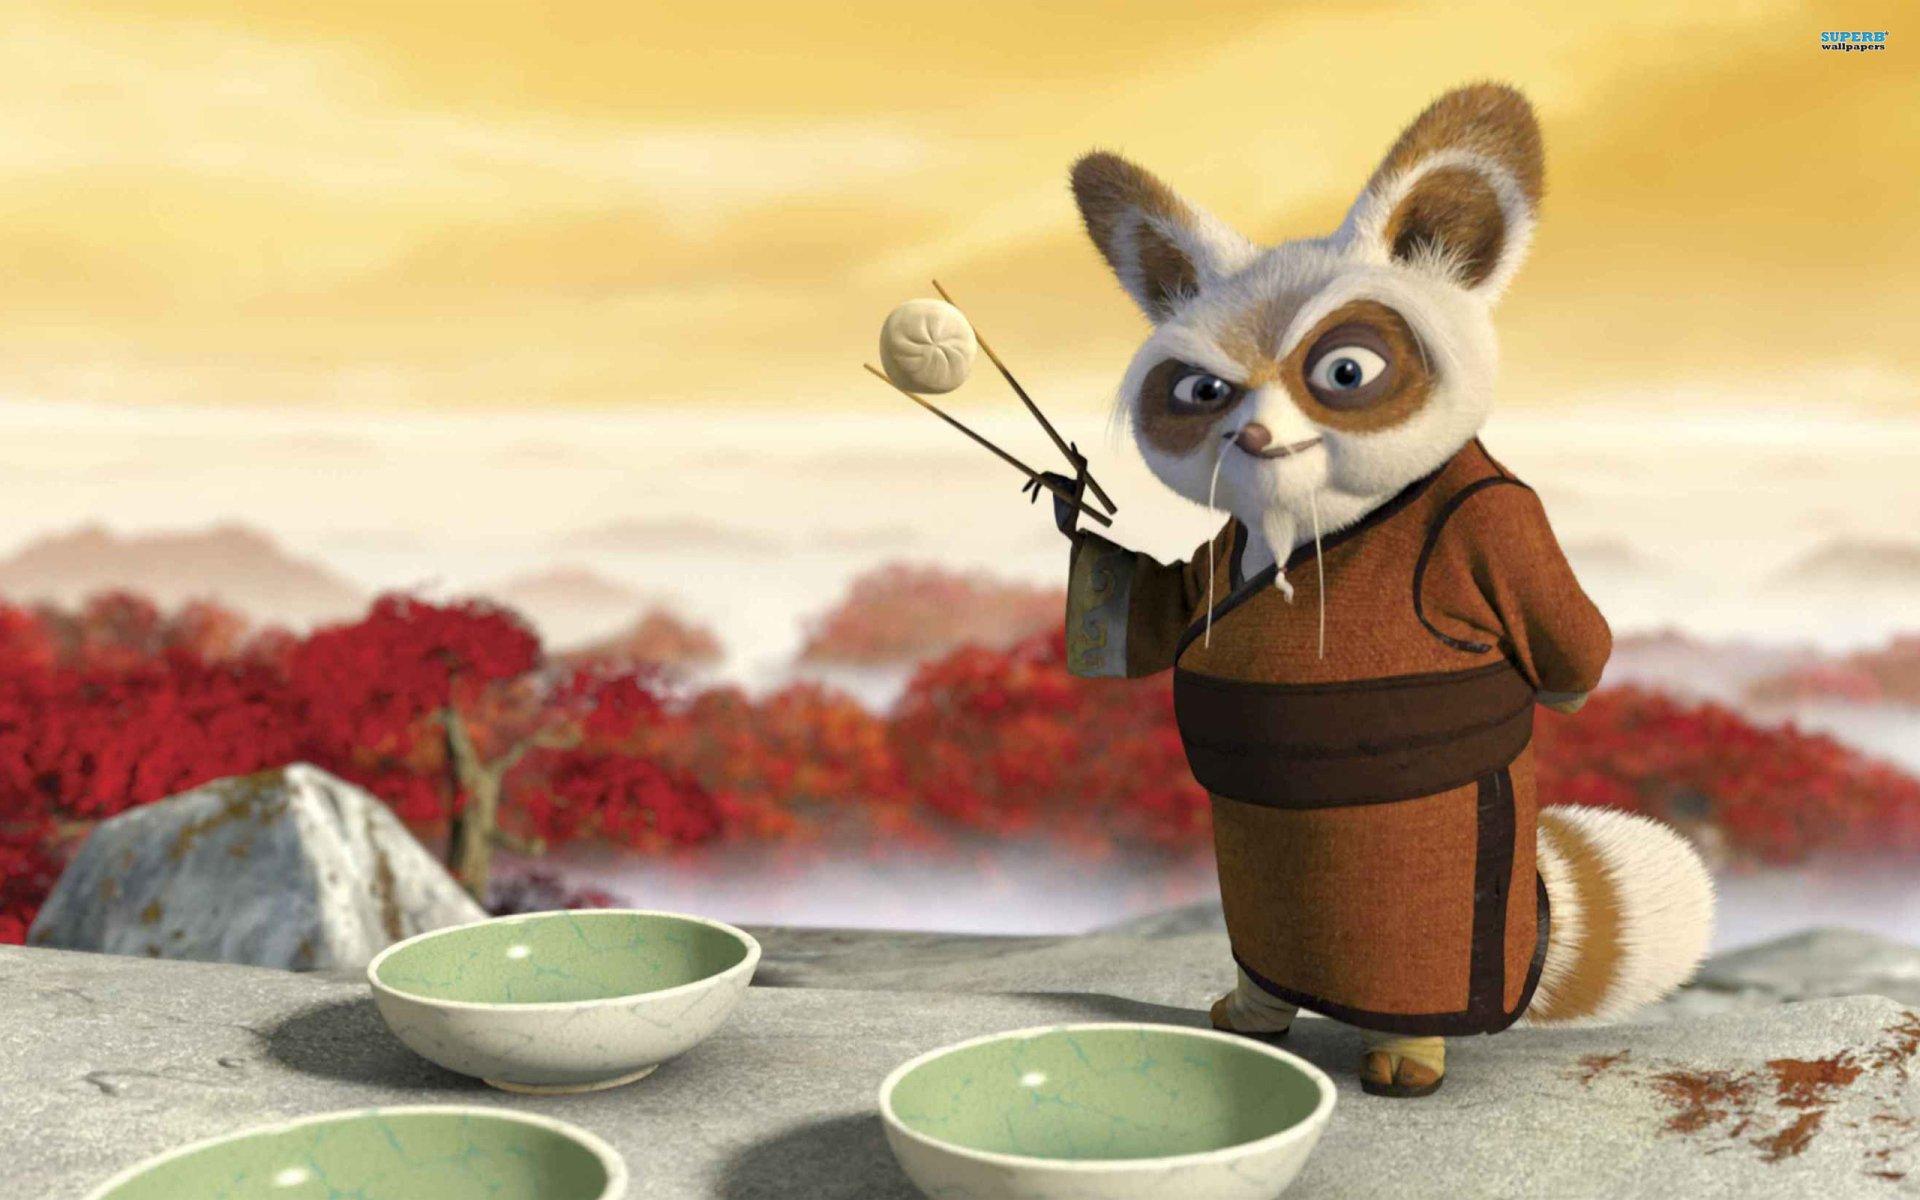 Kung Fu Panda Full HD Wallpaper and Background Image